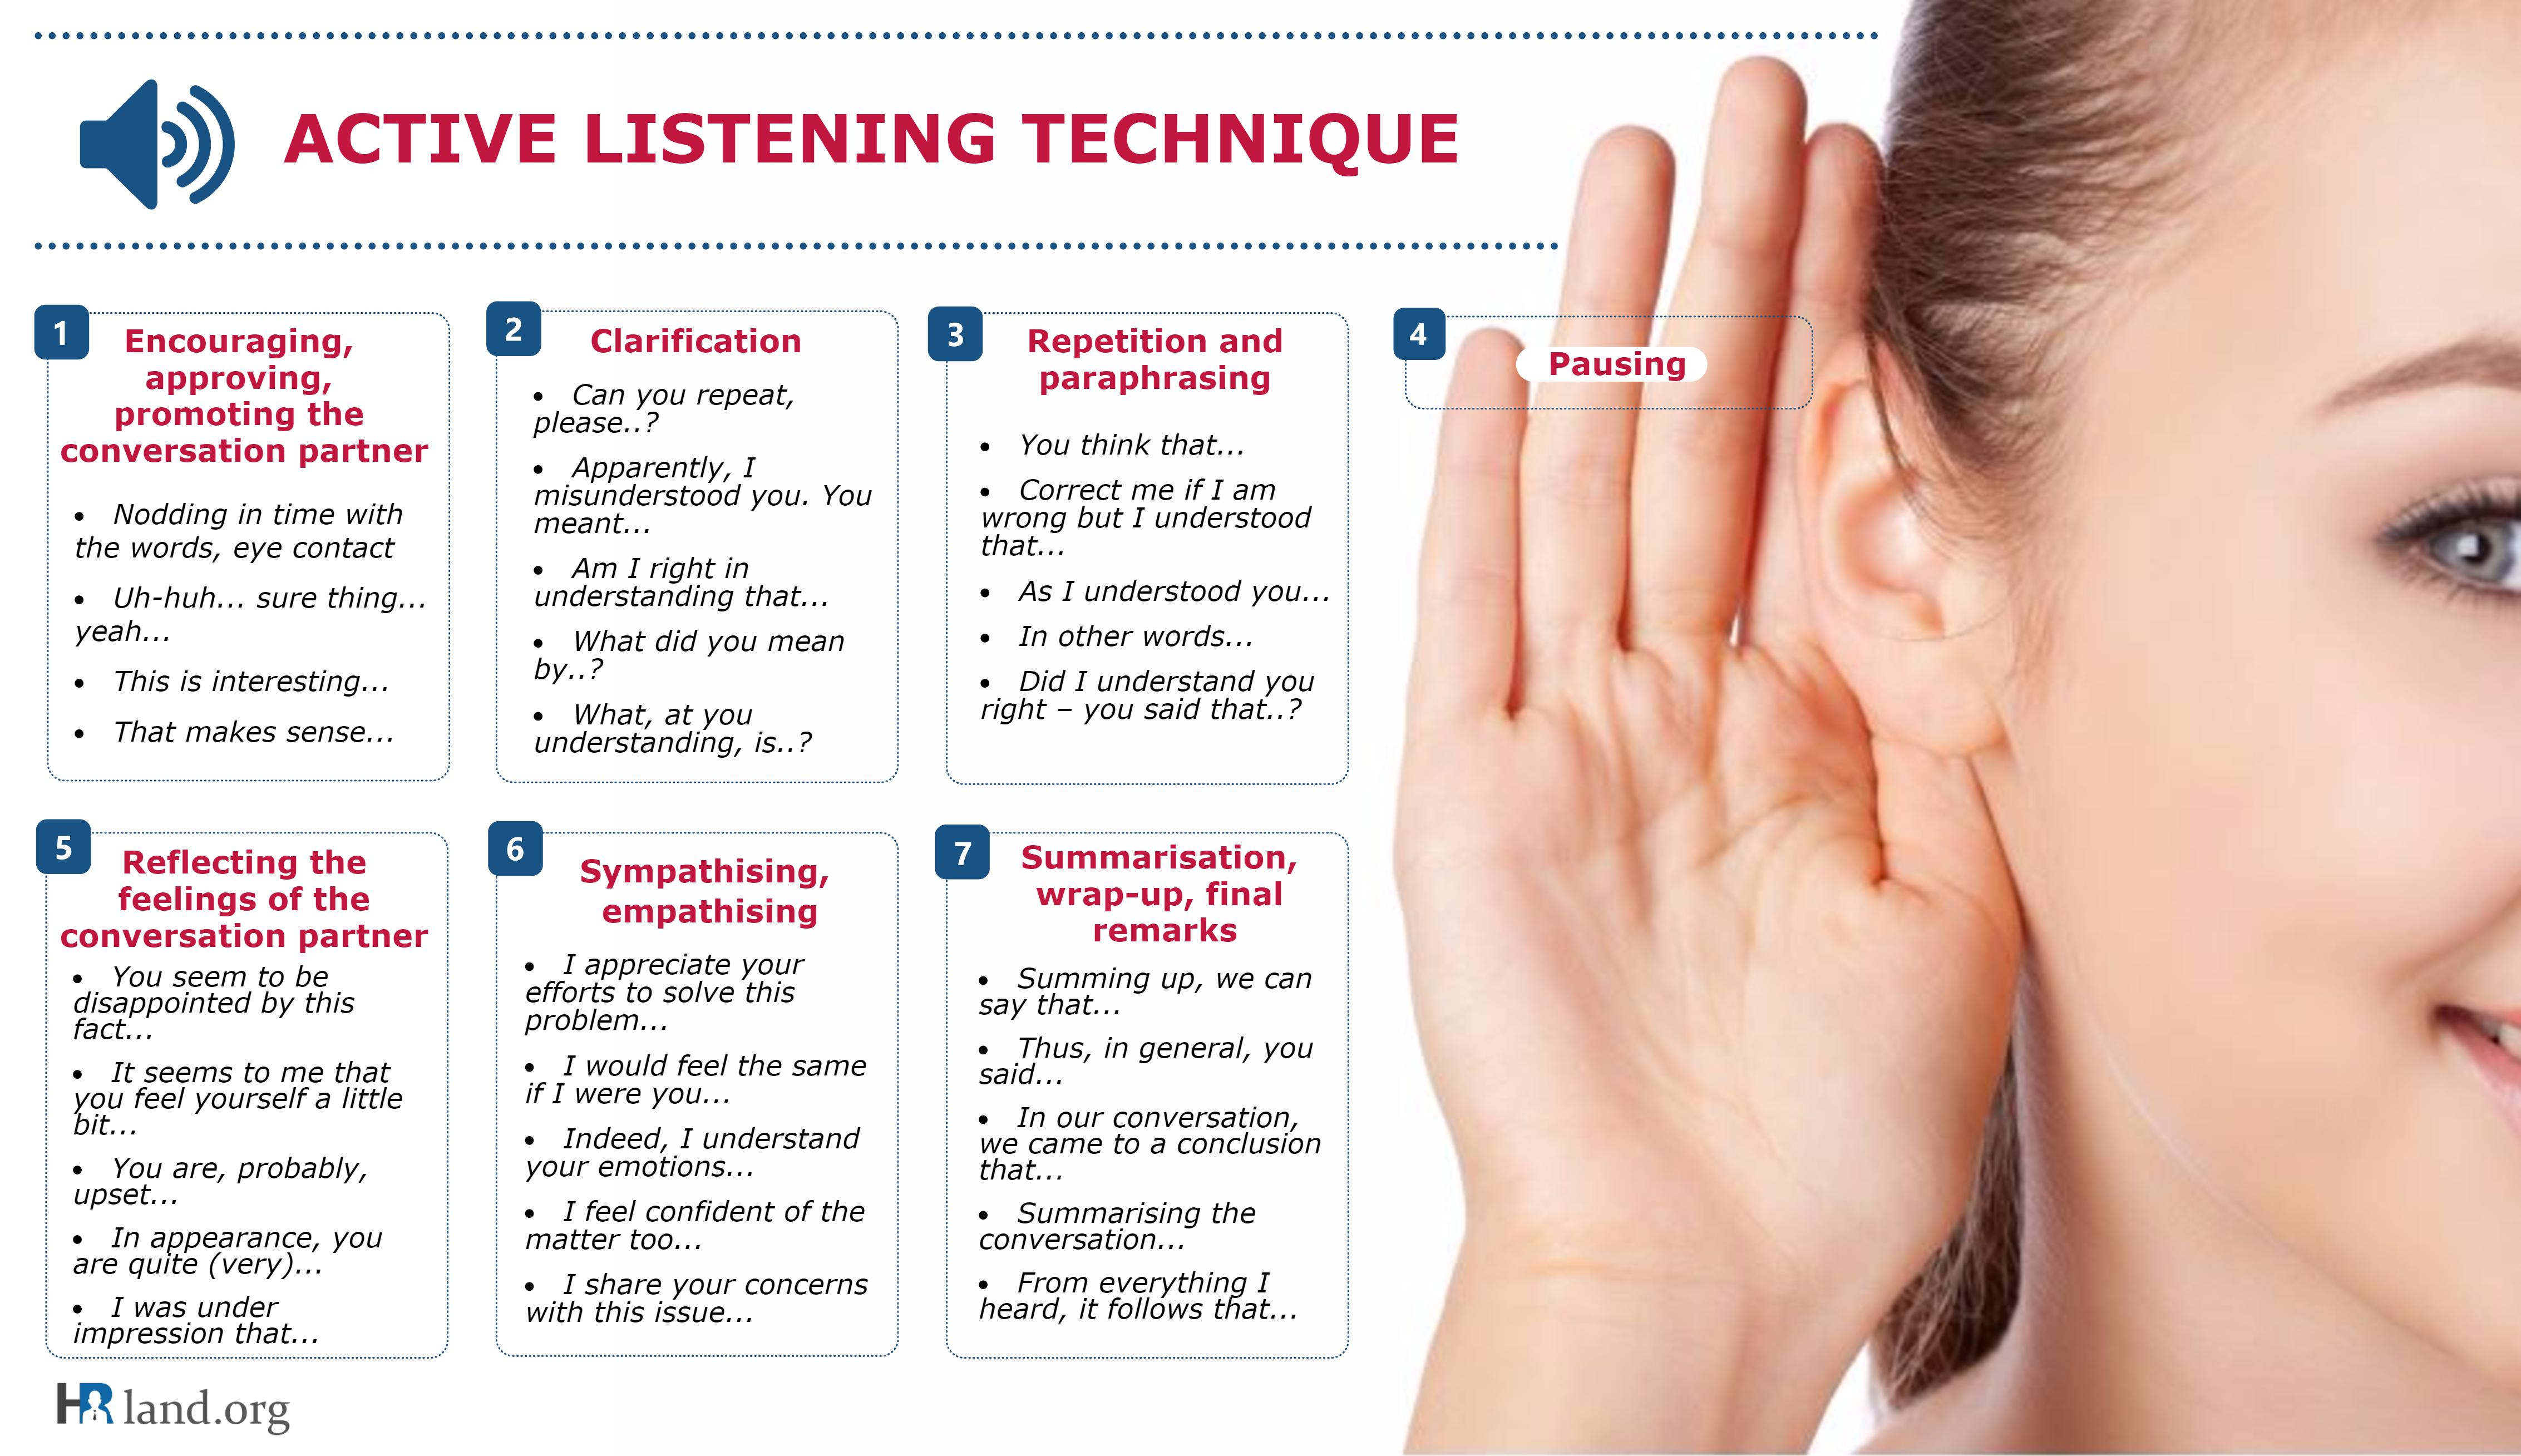 Active listening technique